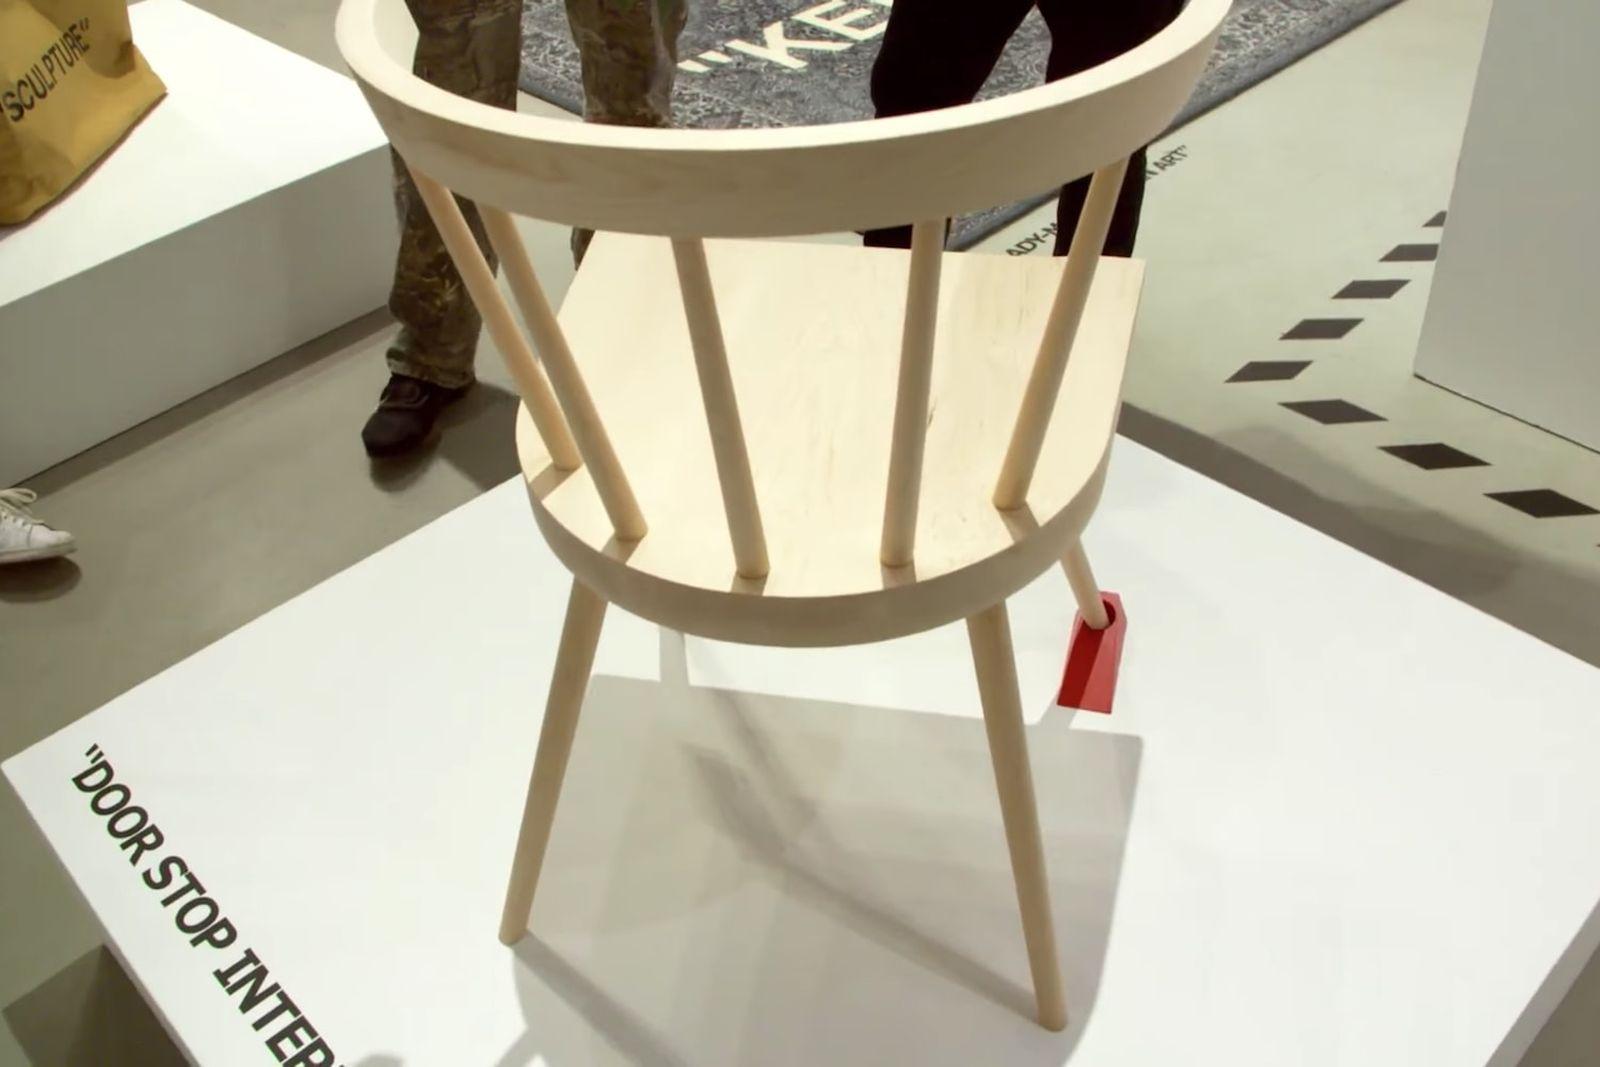 virgil-abloh-makerad-chair-design-01